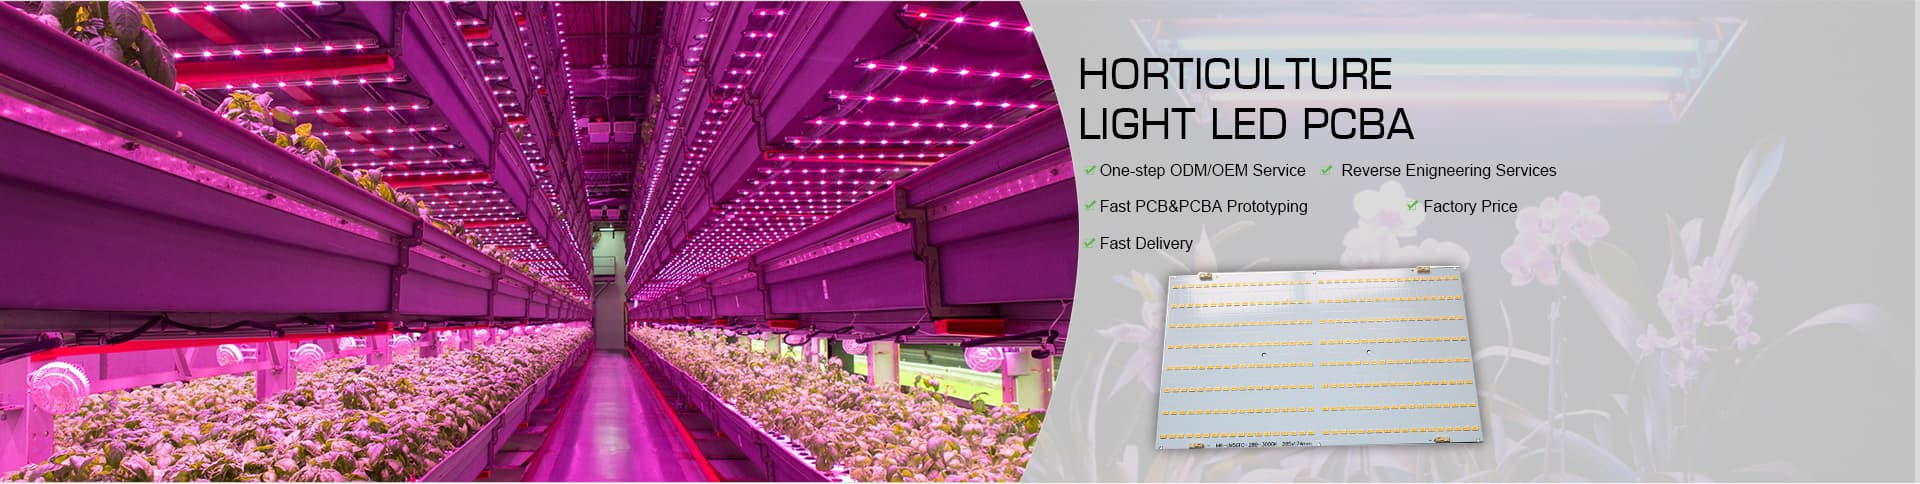 Horticulture Light LED PCBA